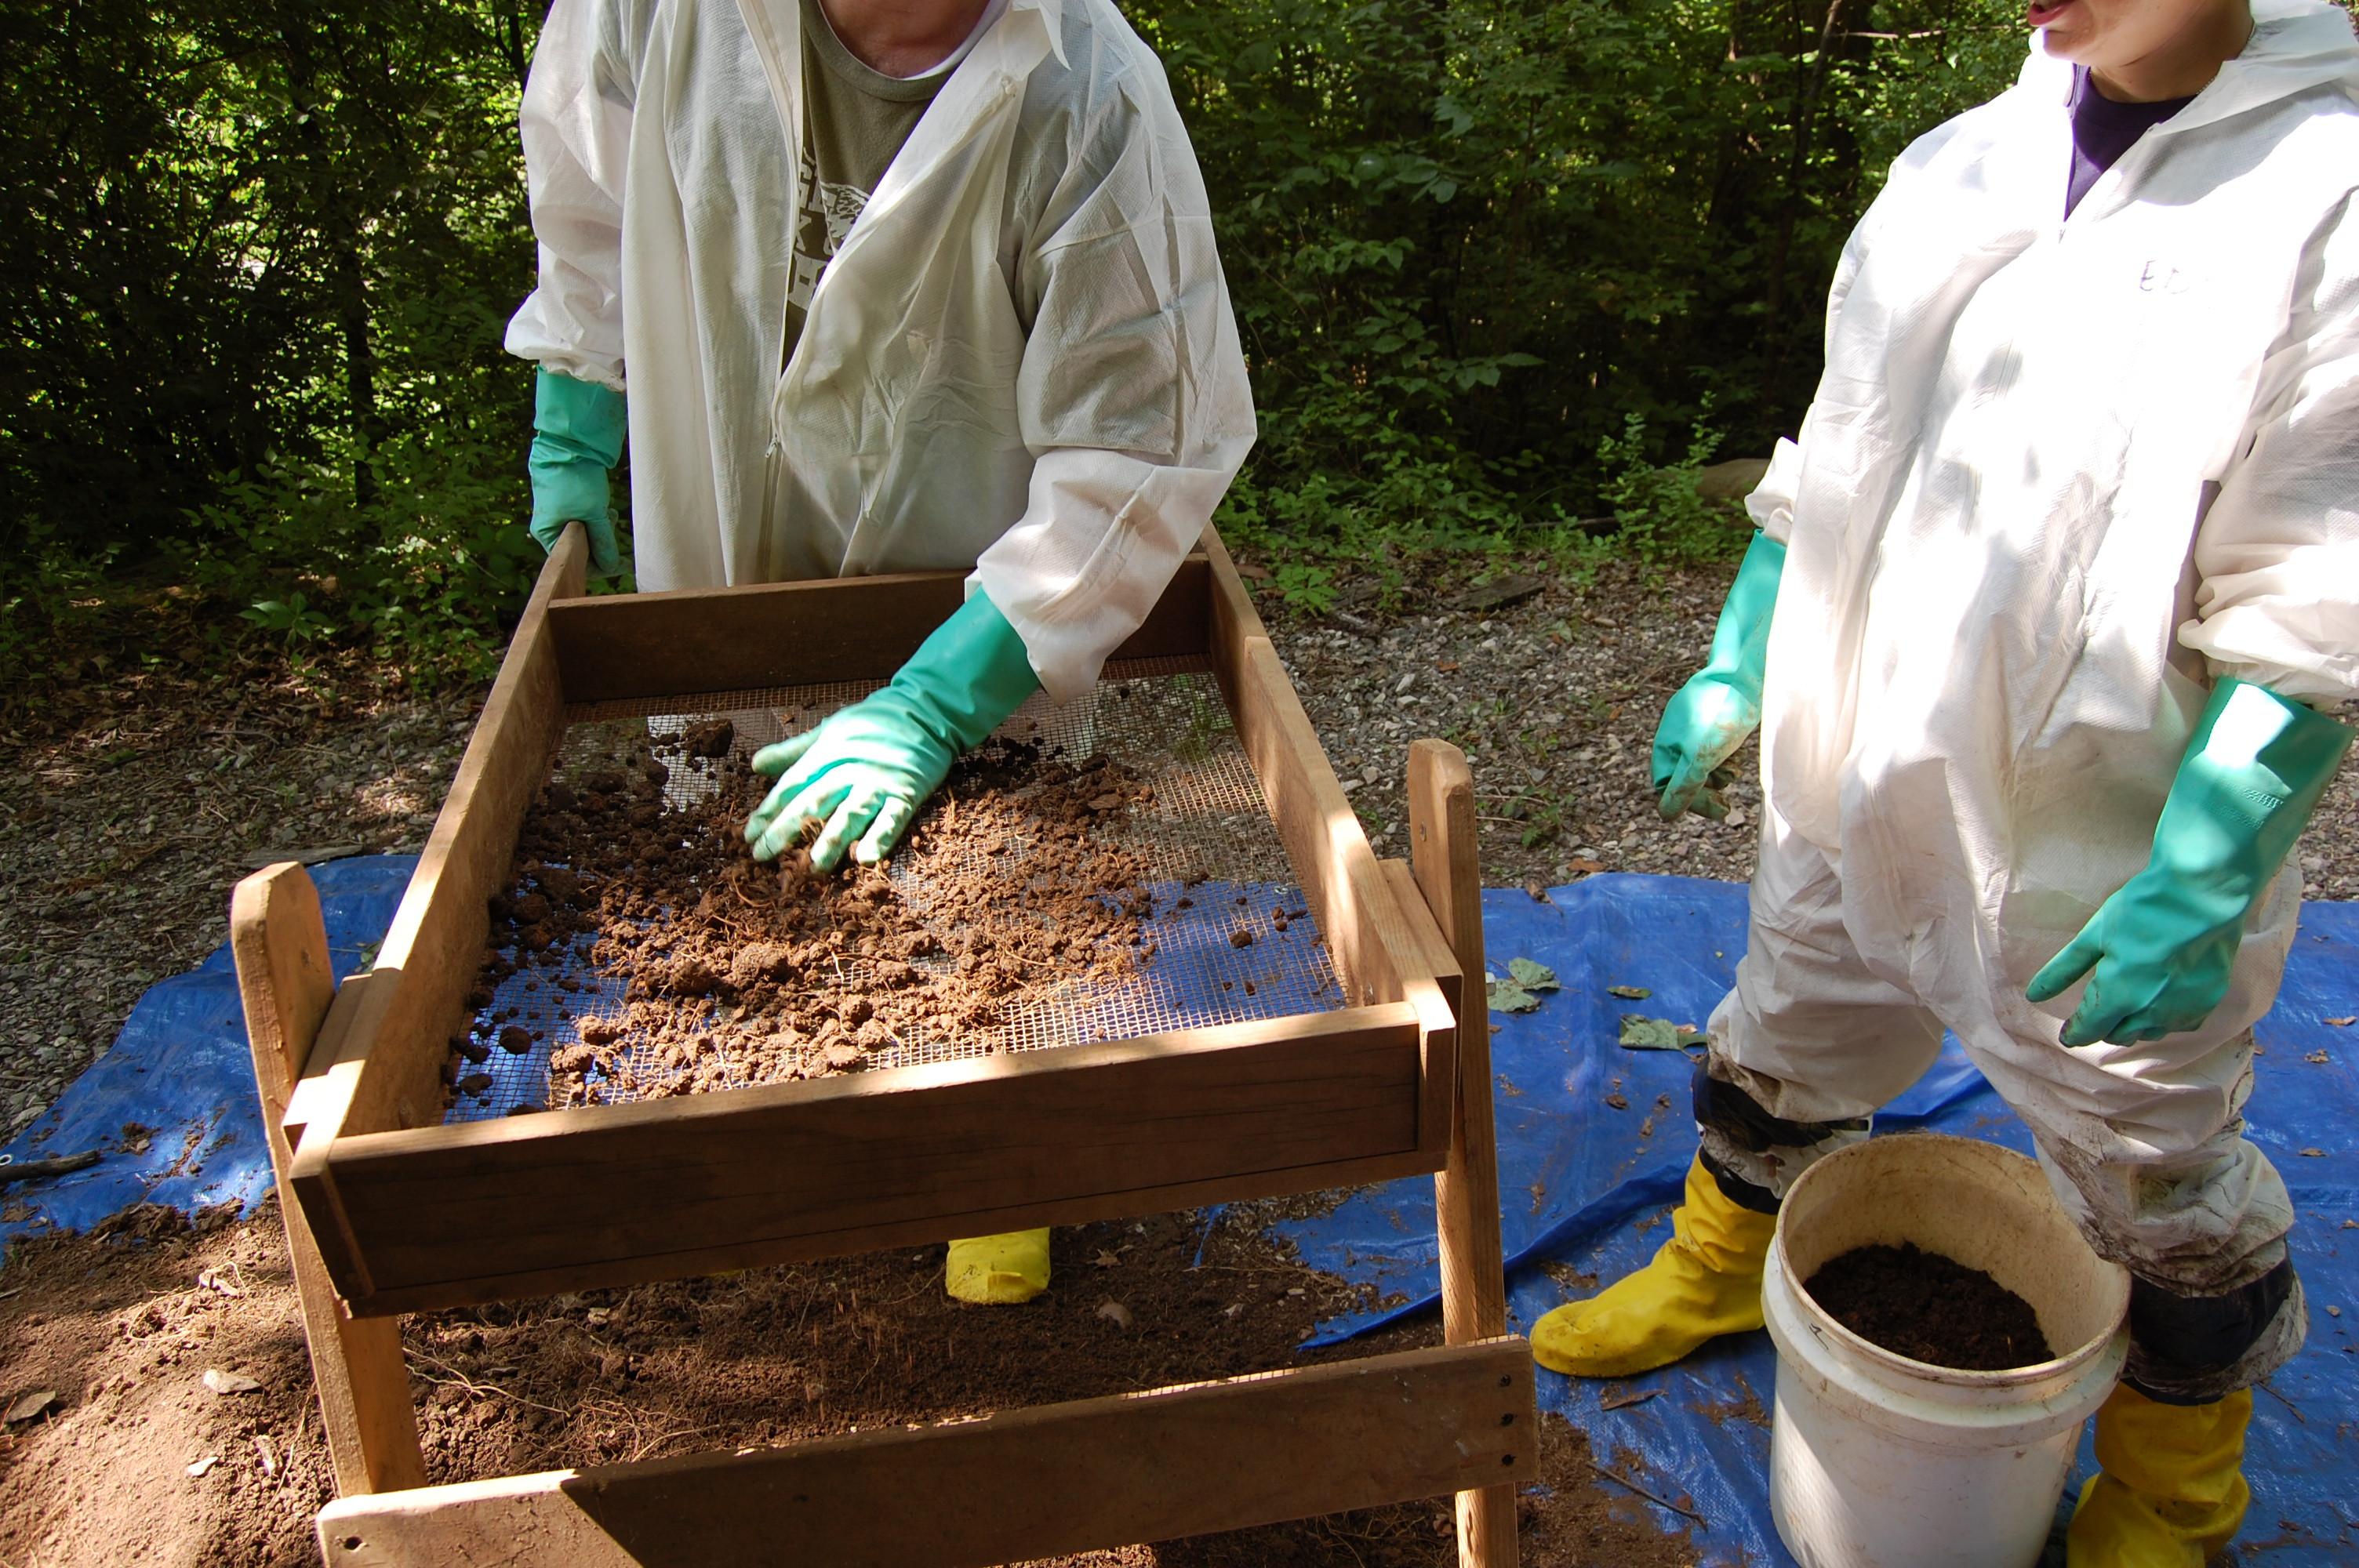 Sifting soil